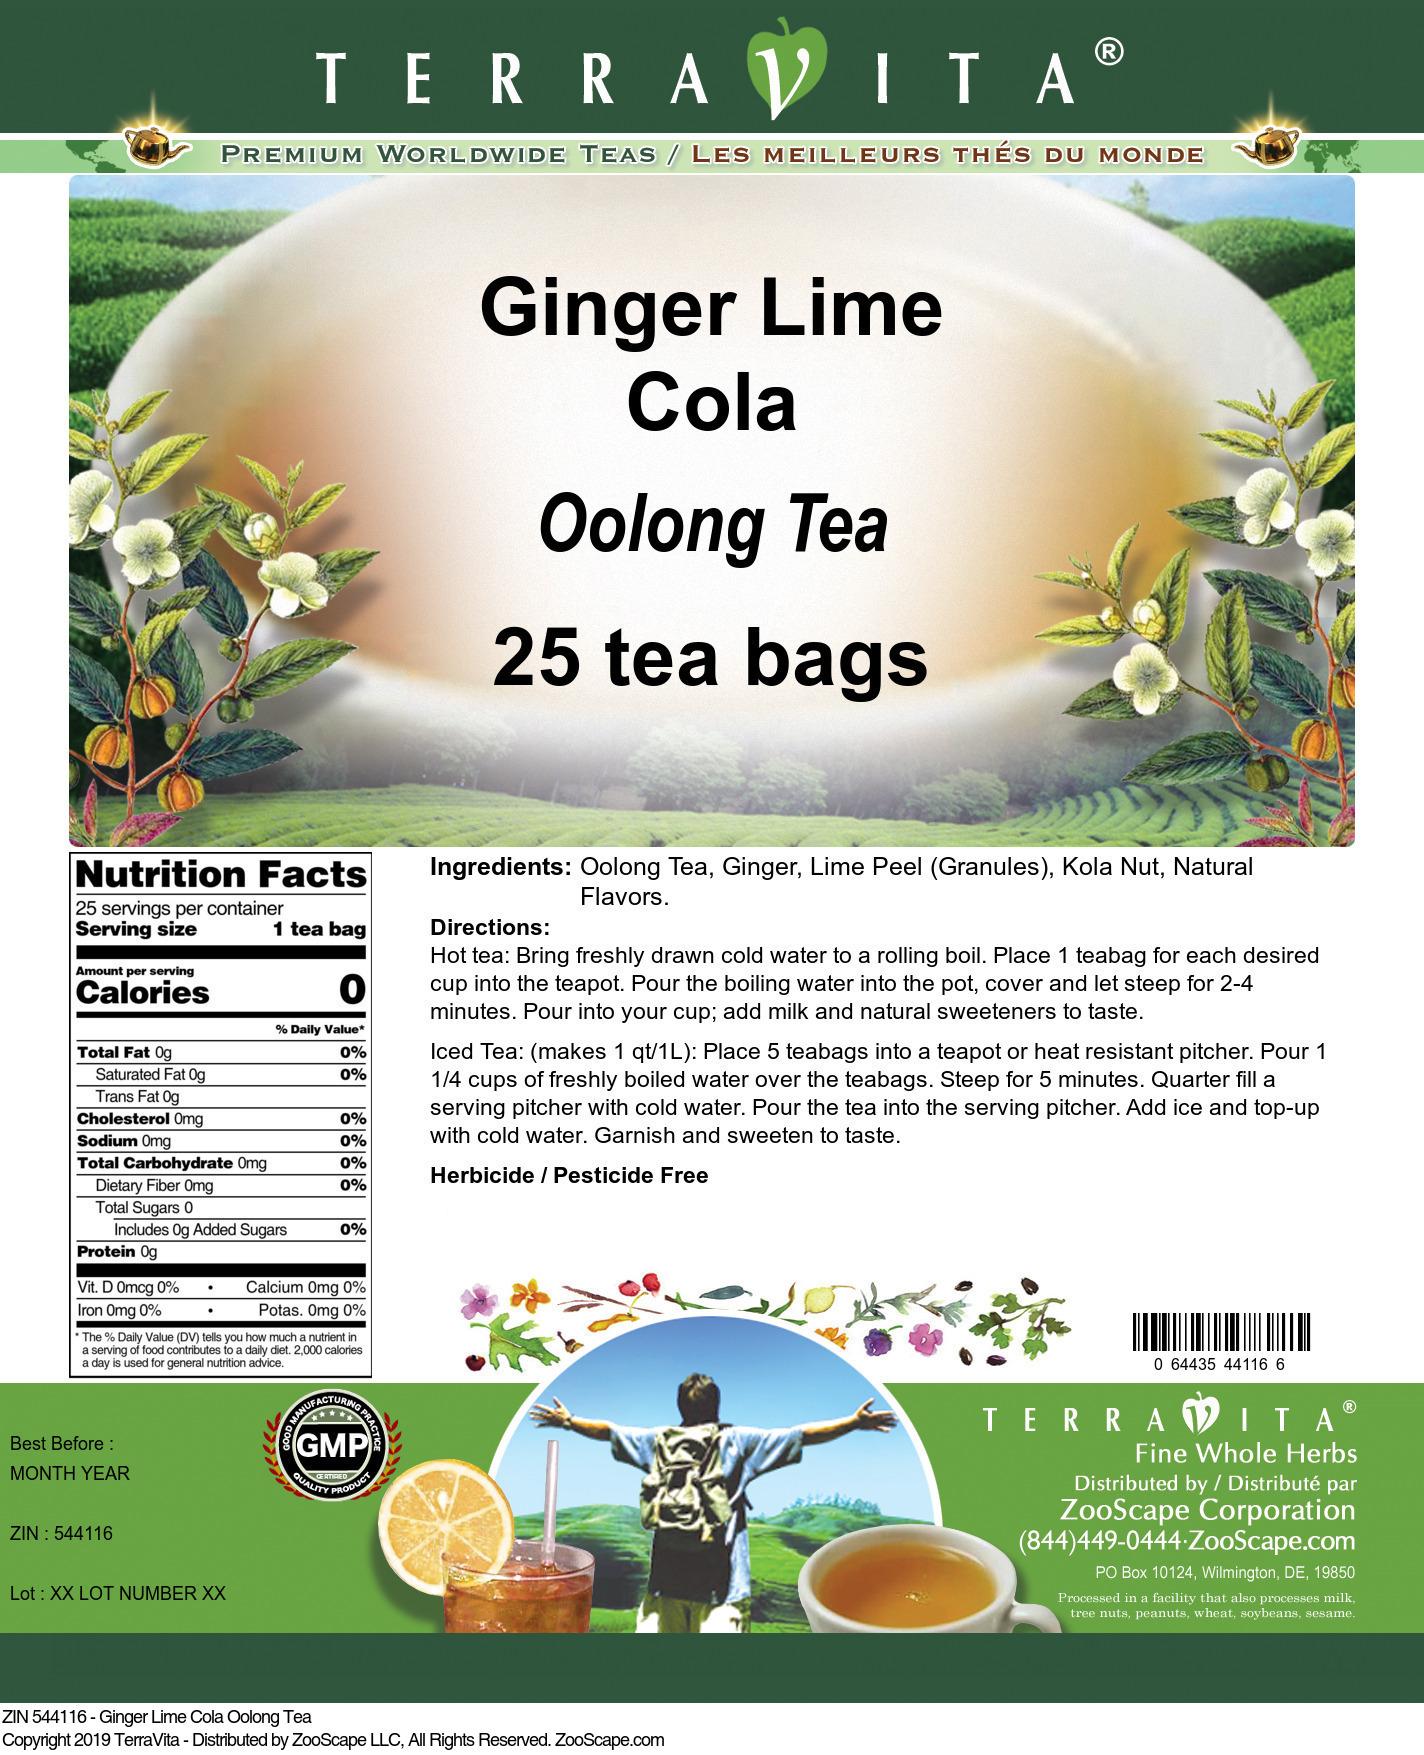 Ginger Lime Cola Oolong Tea